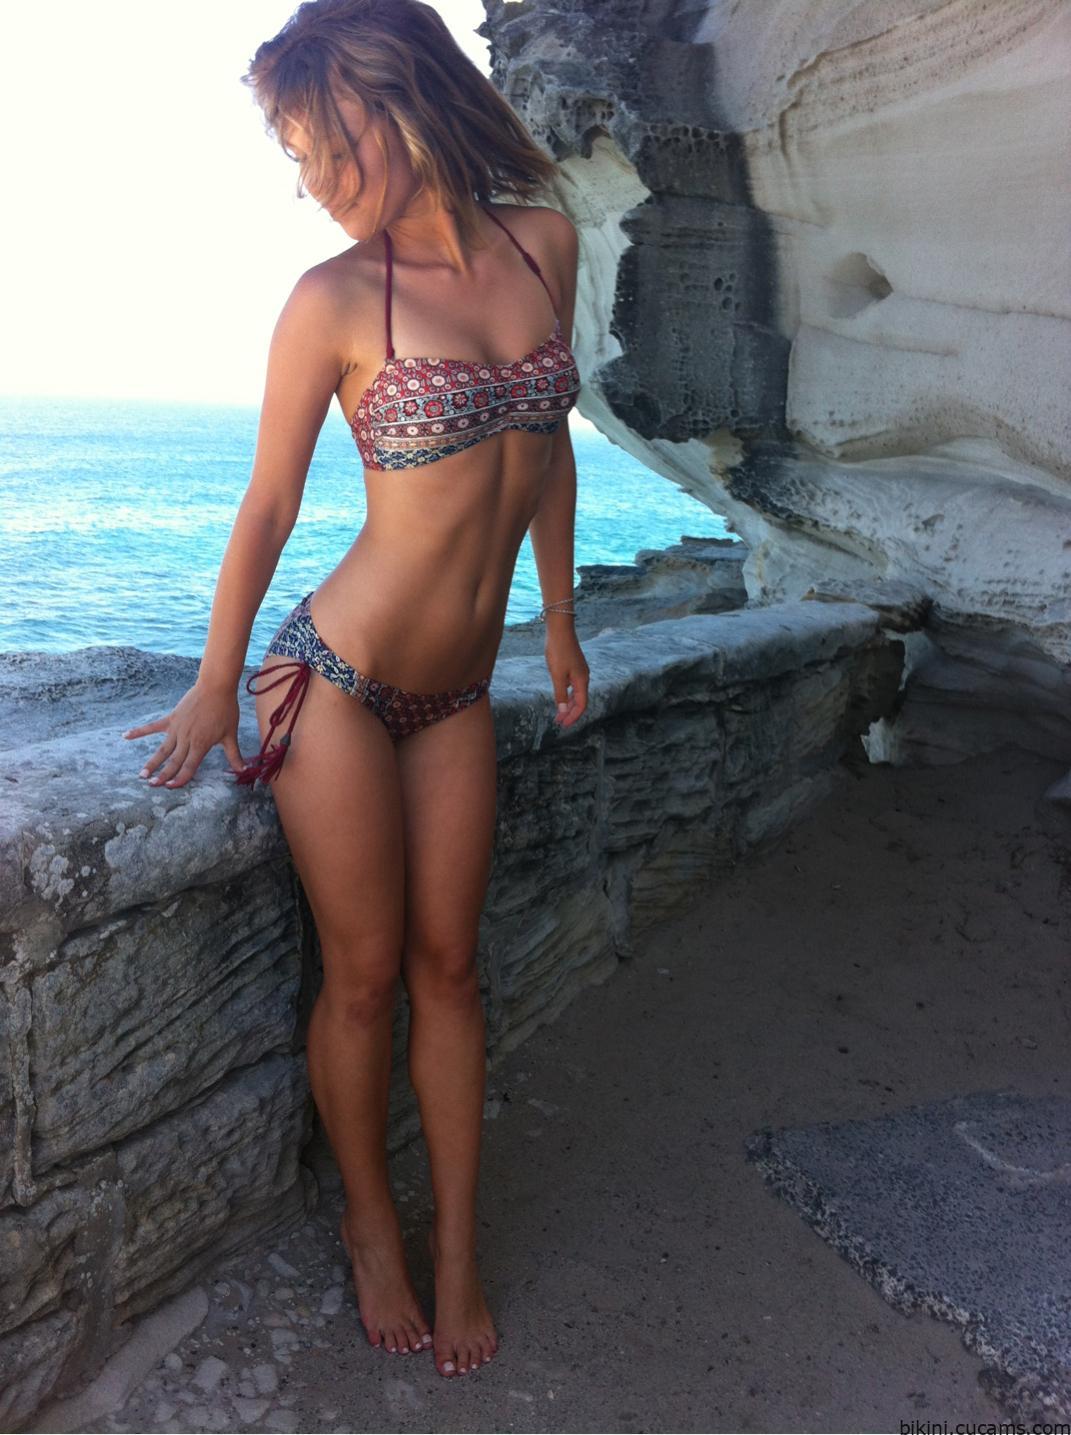 Bikini Gloryhole Master by bikini.cucams.com